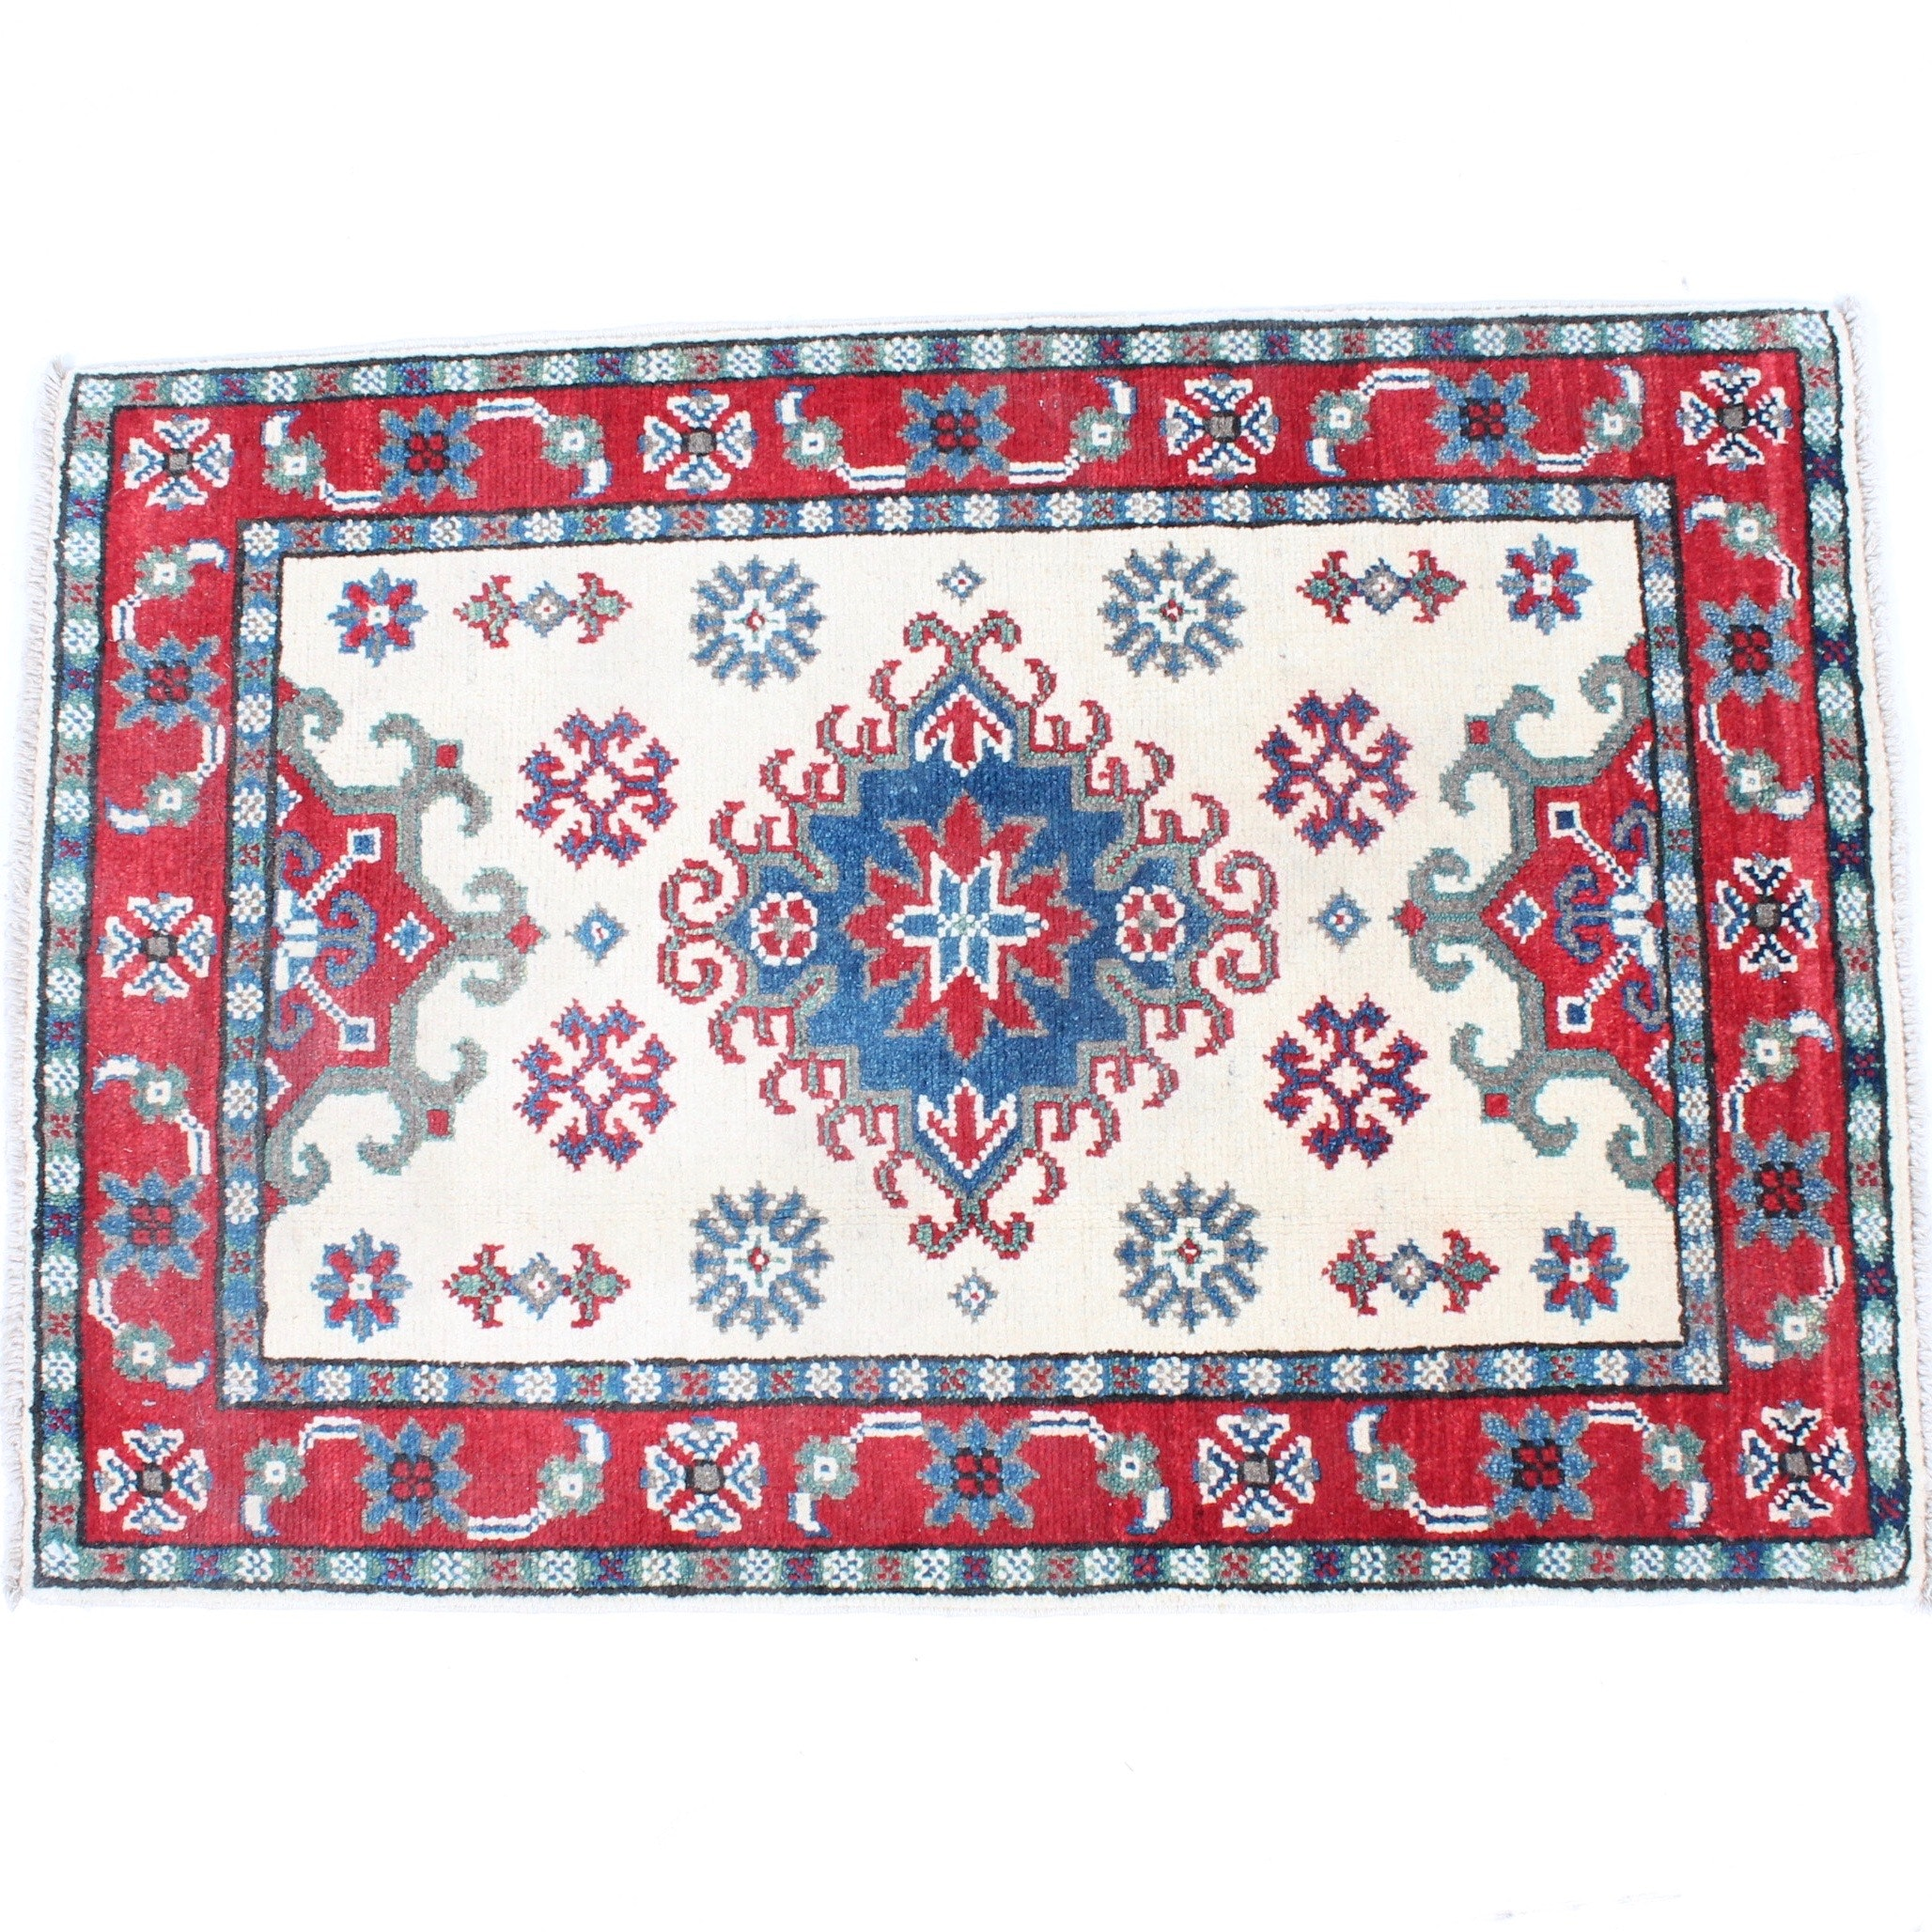 Fine Hand-Knotted Afghani-Caucasian Kazak Rug